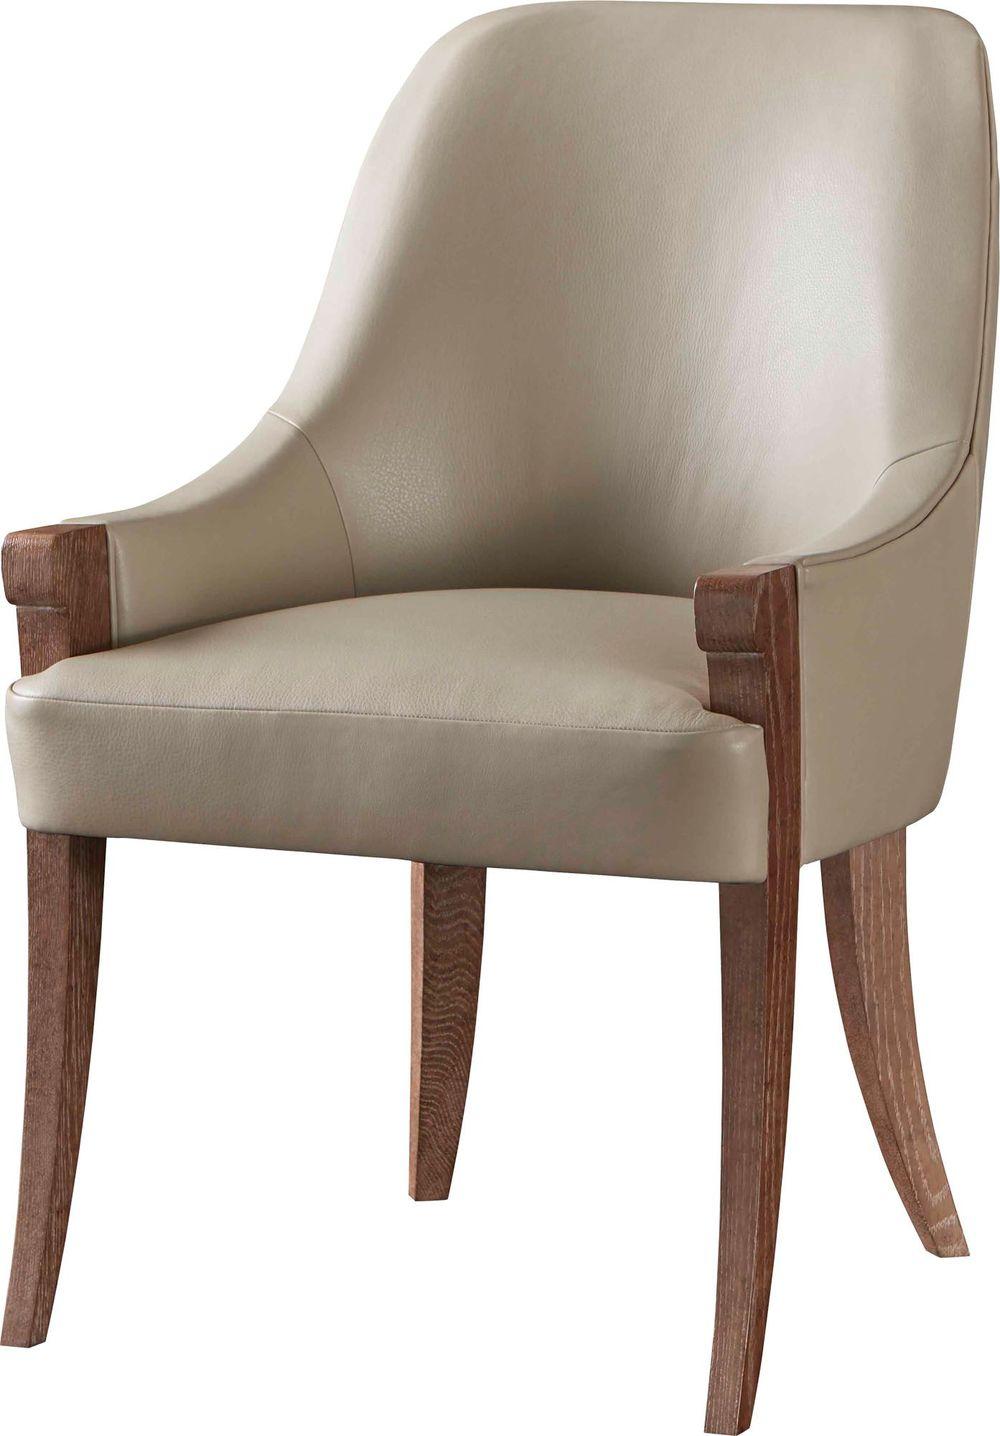 Baker Furniture - Atticus Armchair